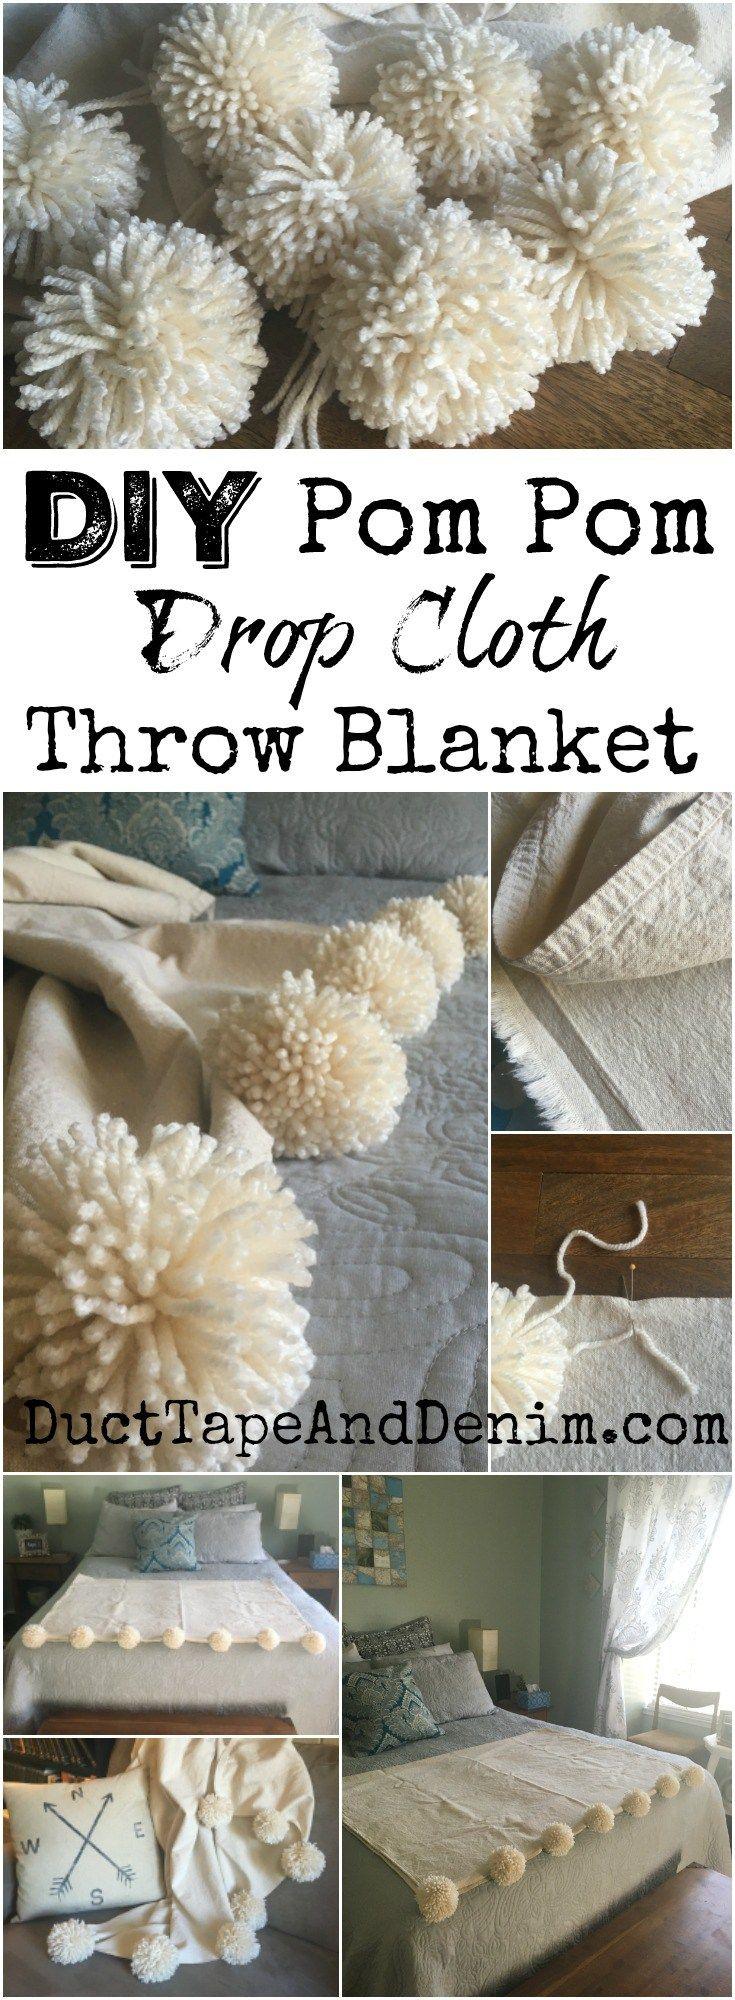 DIY pom pom drop cloth throw blanket tutorial on DuctTapeAndDenim.com